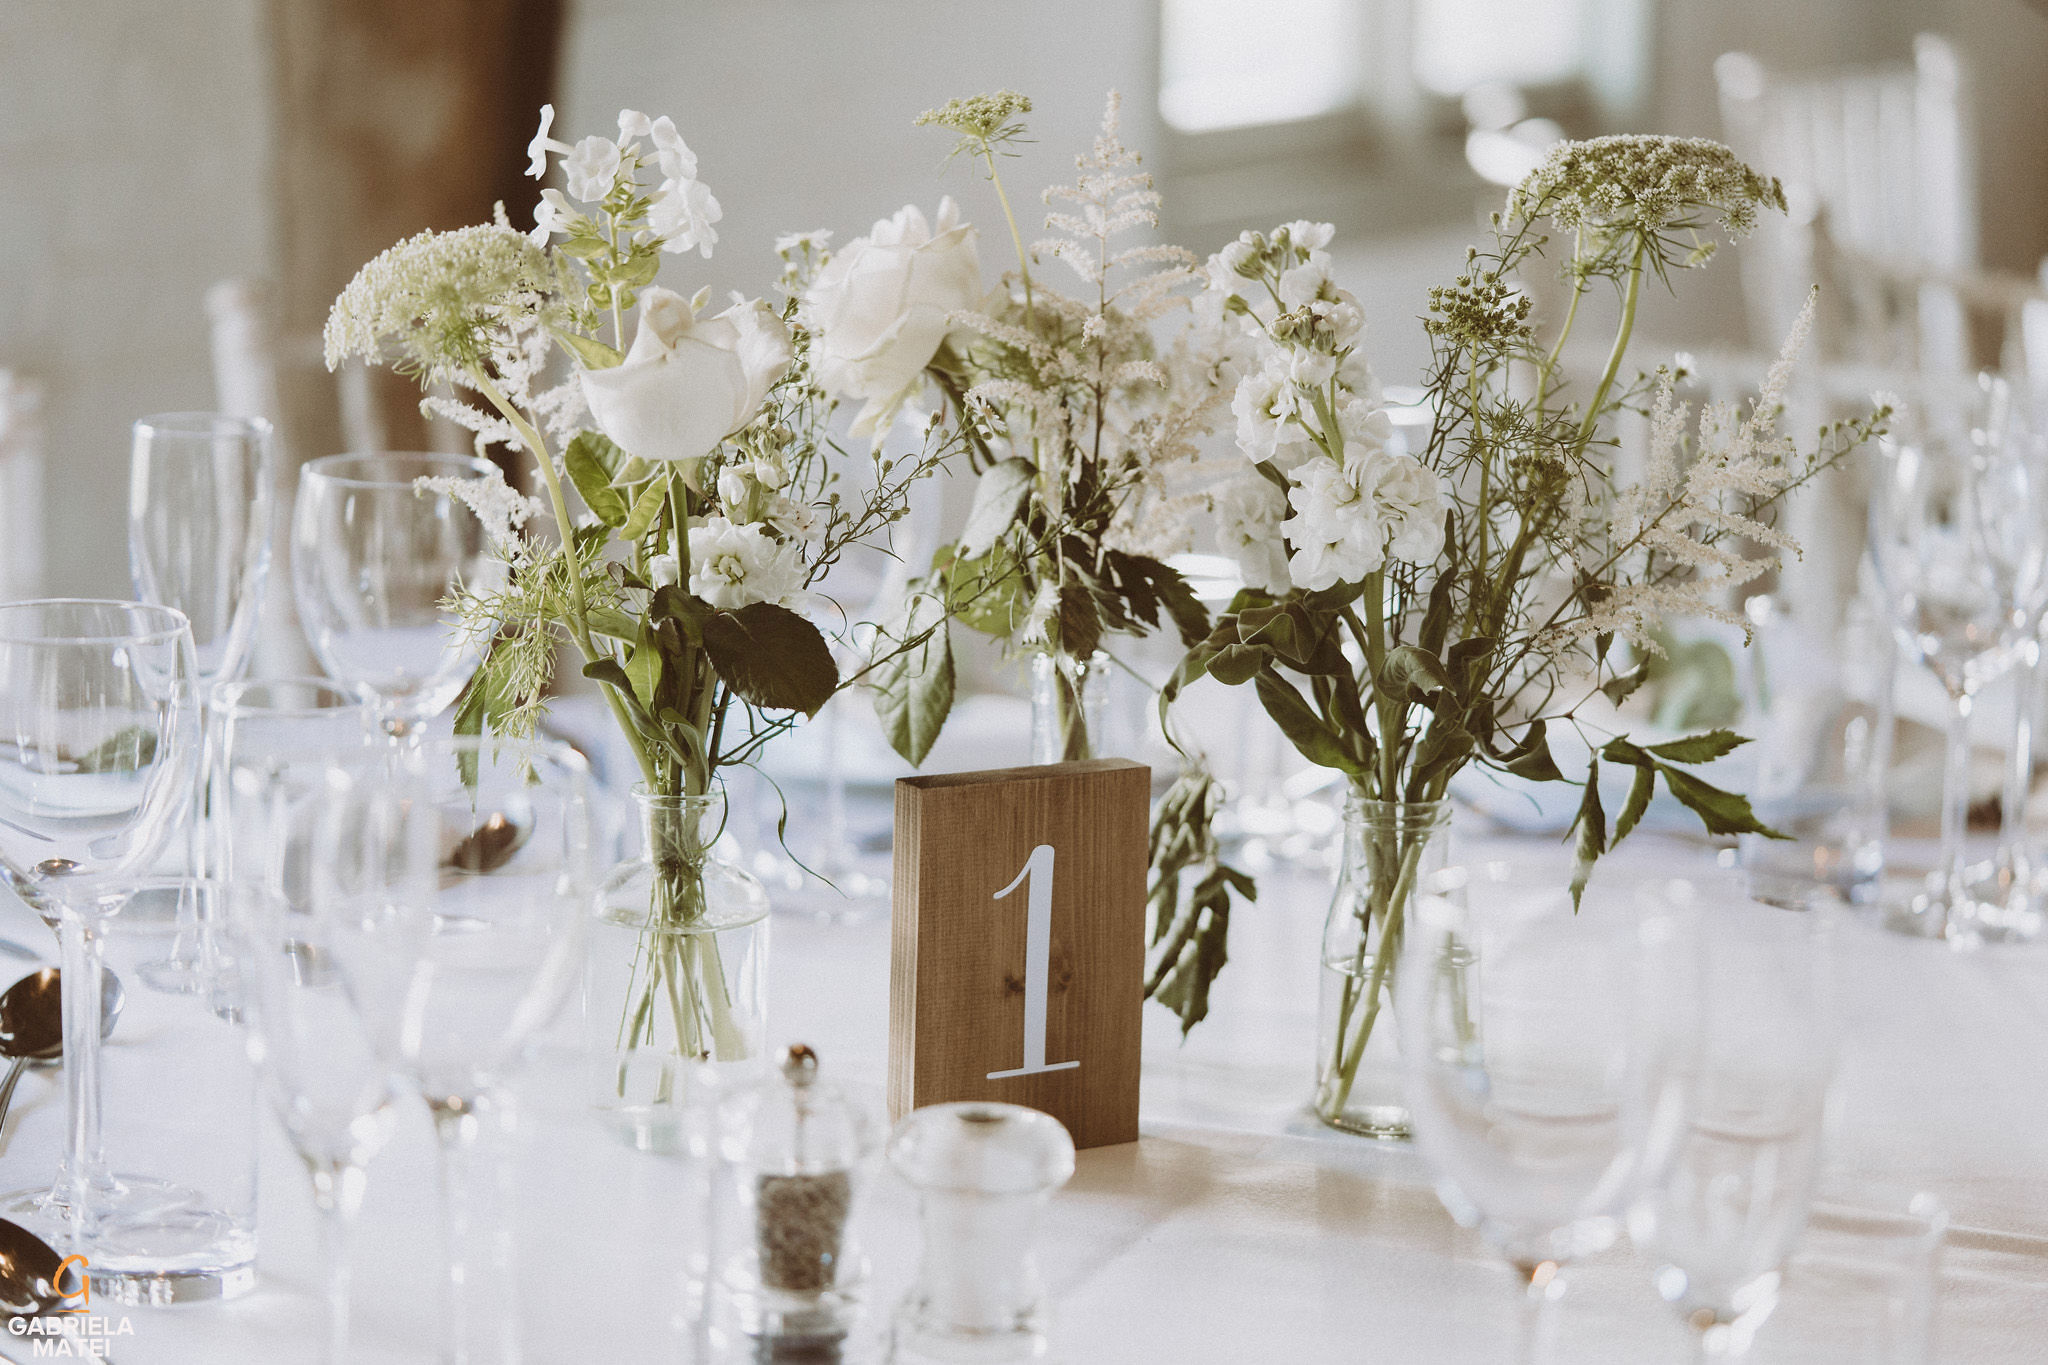 wedding table details at South Stoke Barn wedding venue in Arundel